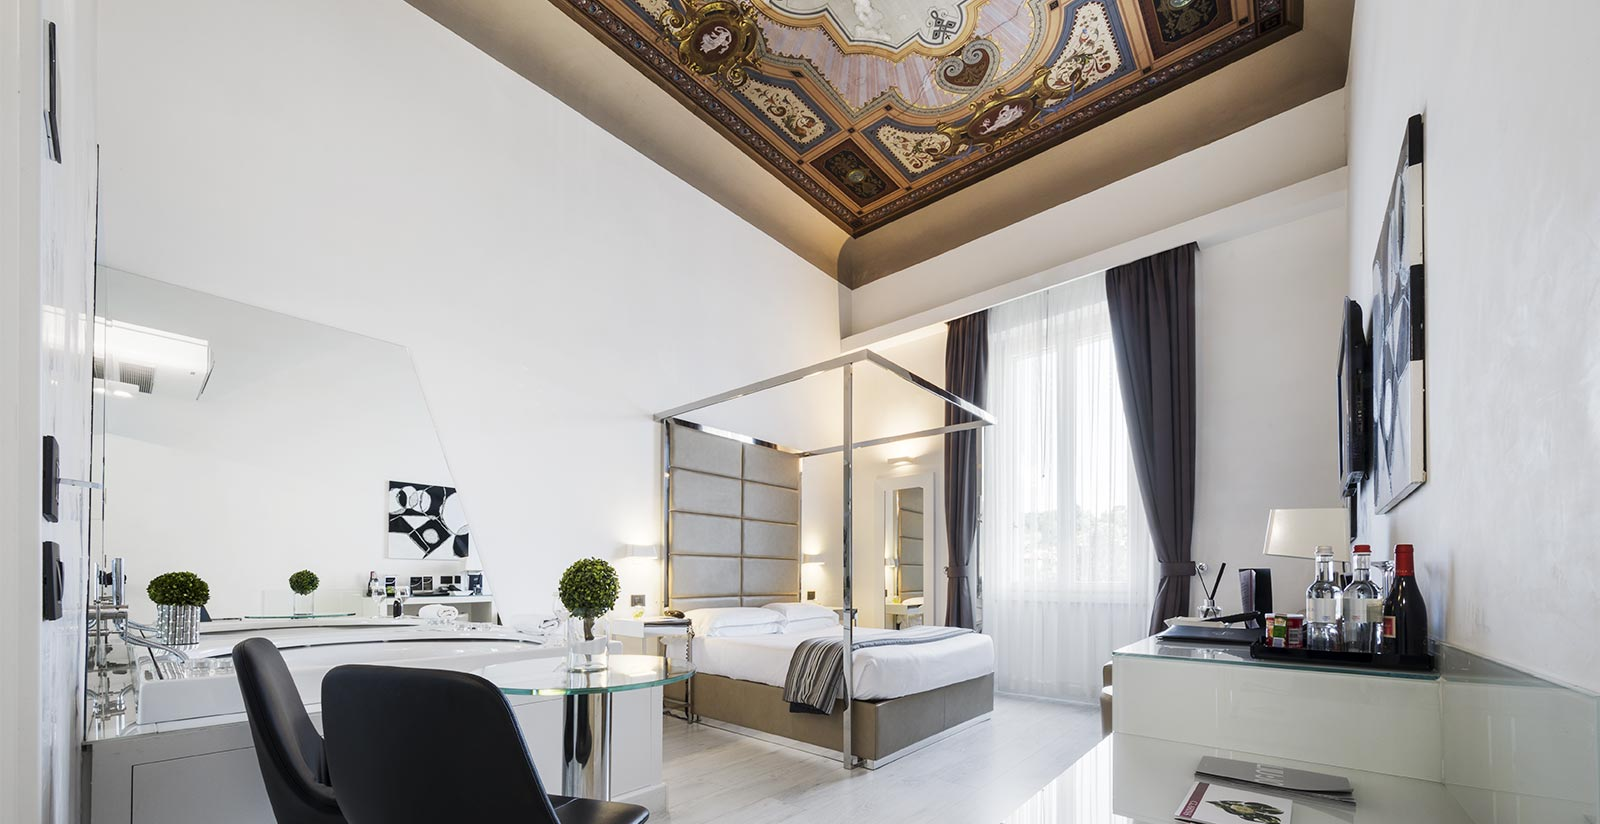 Hotel river firenze offerte soggiorno a firenze